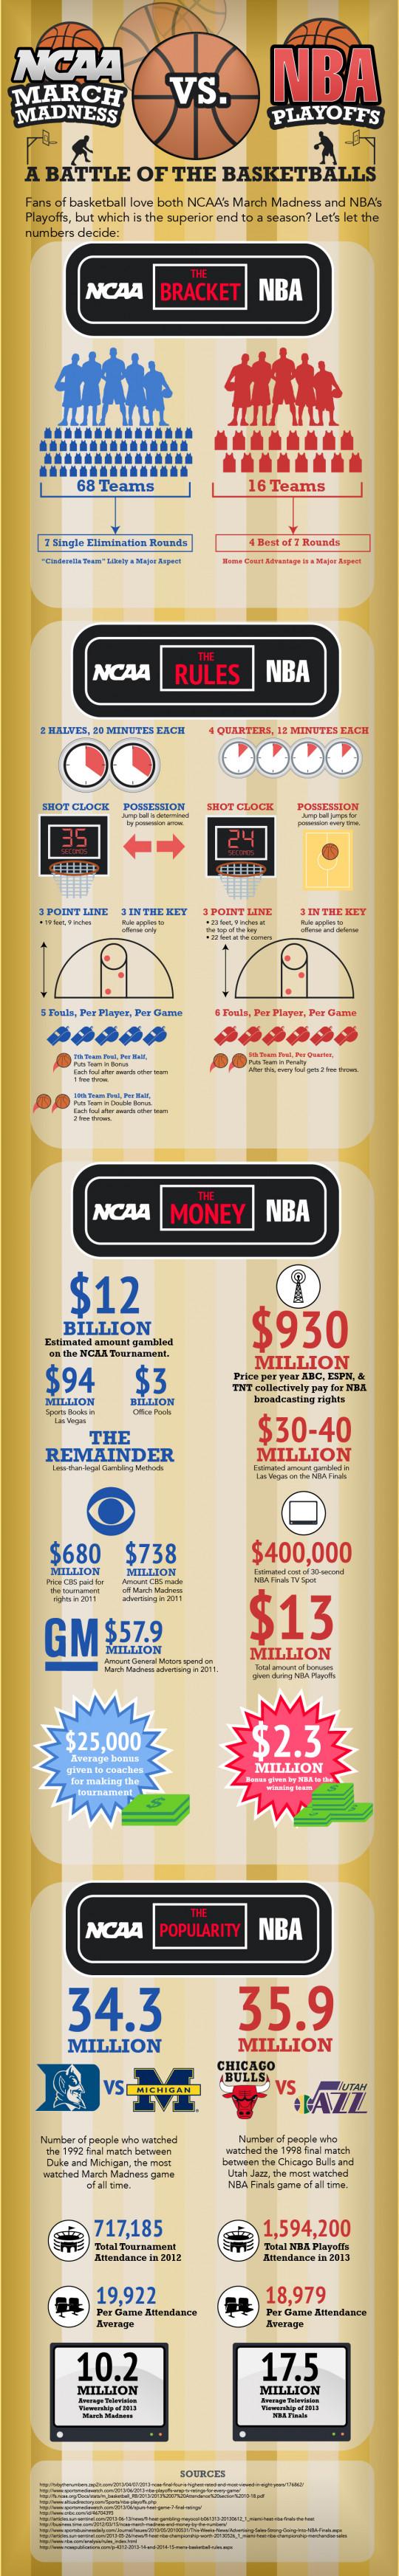 NCAA March Madness vs NBA Playoffs